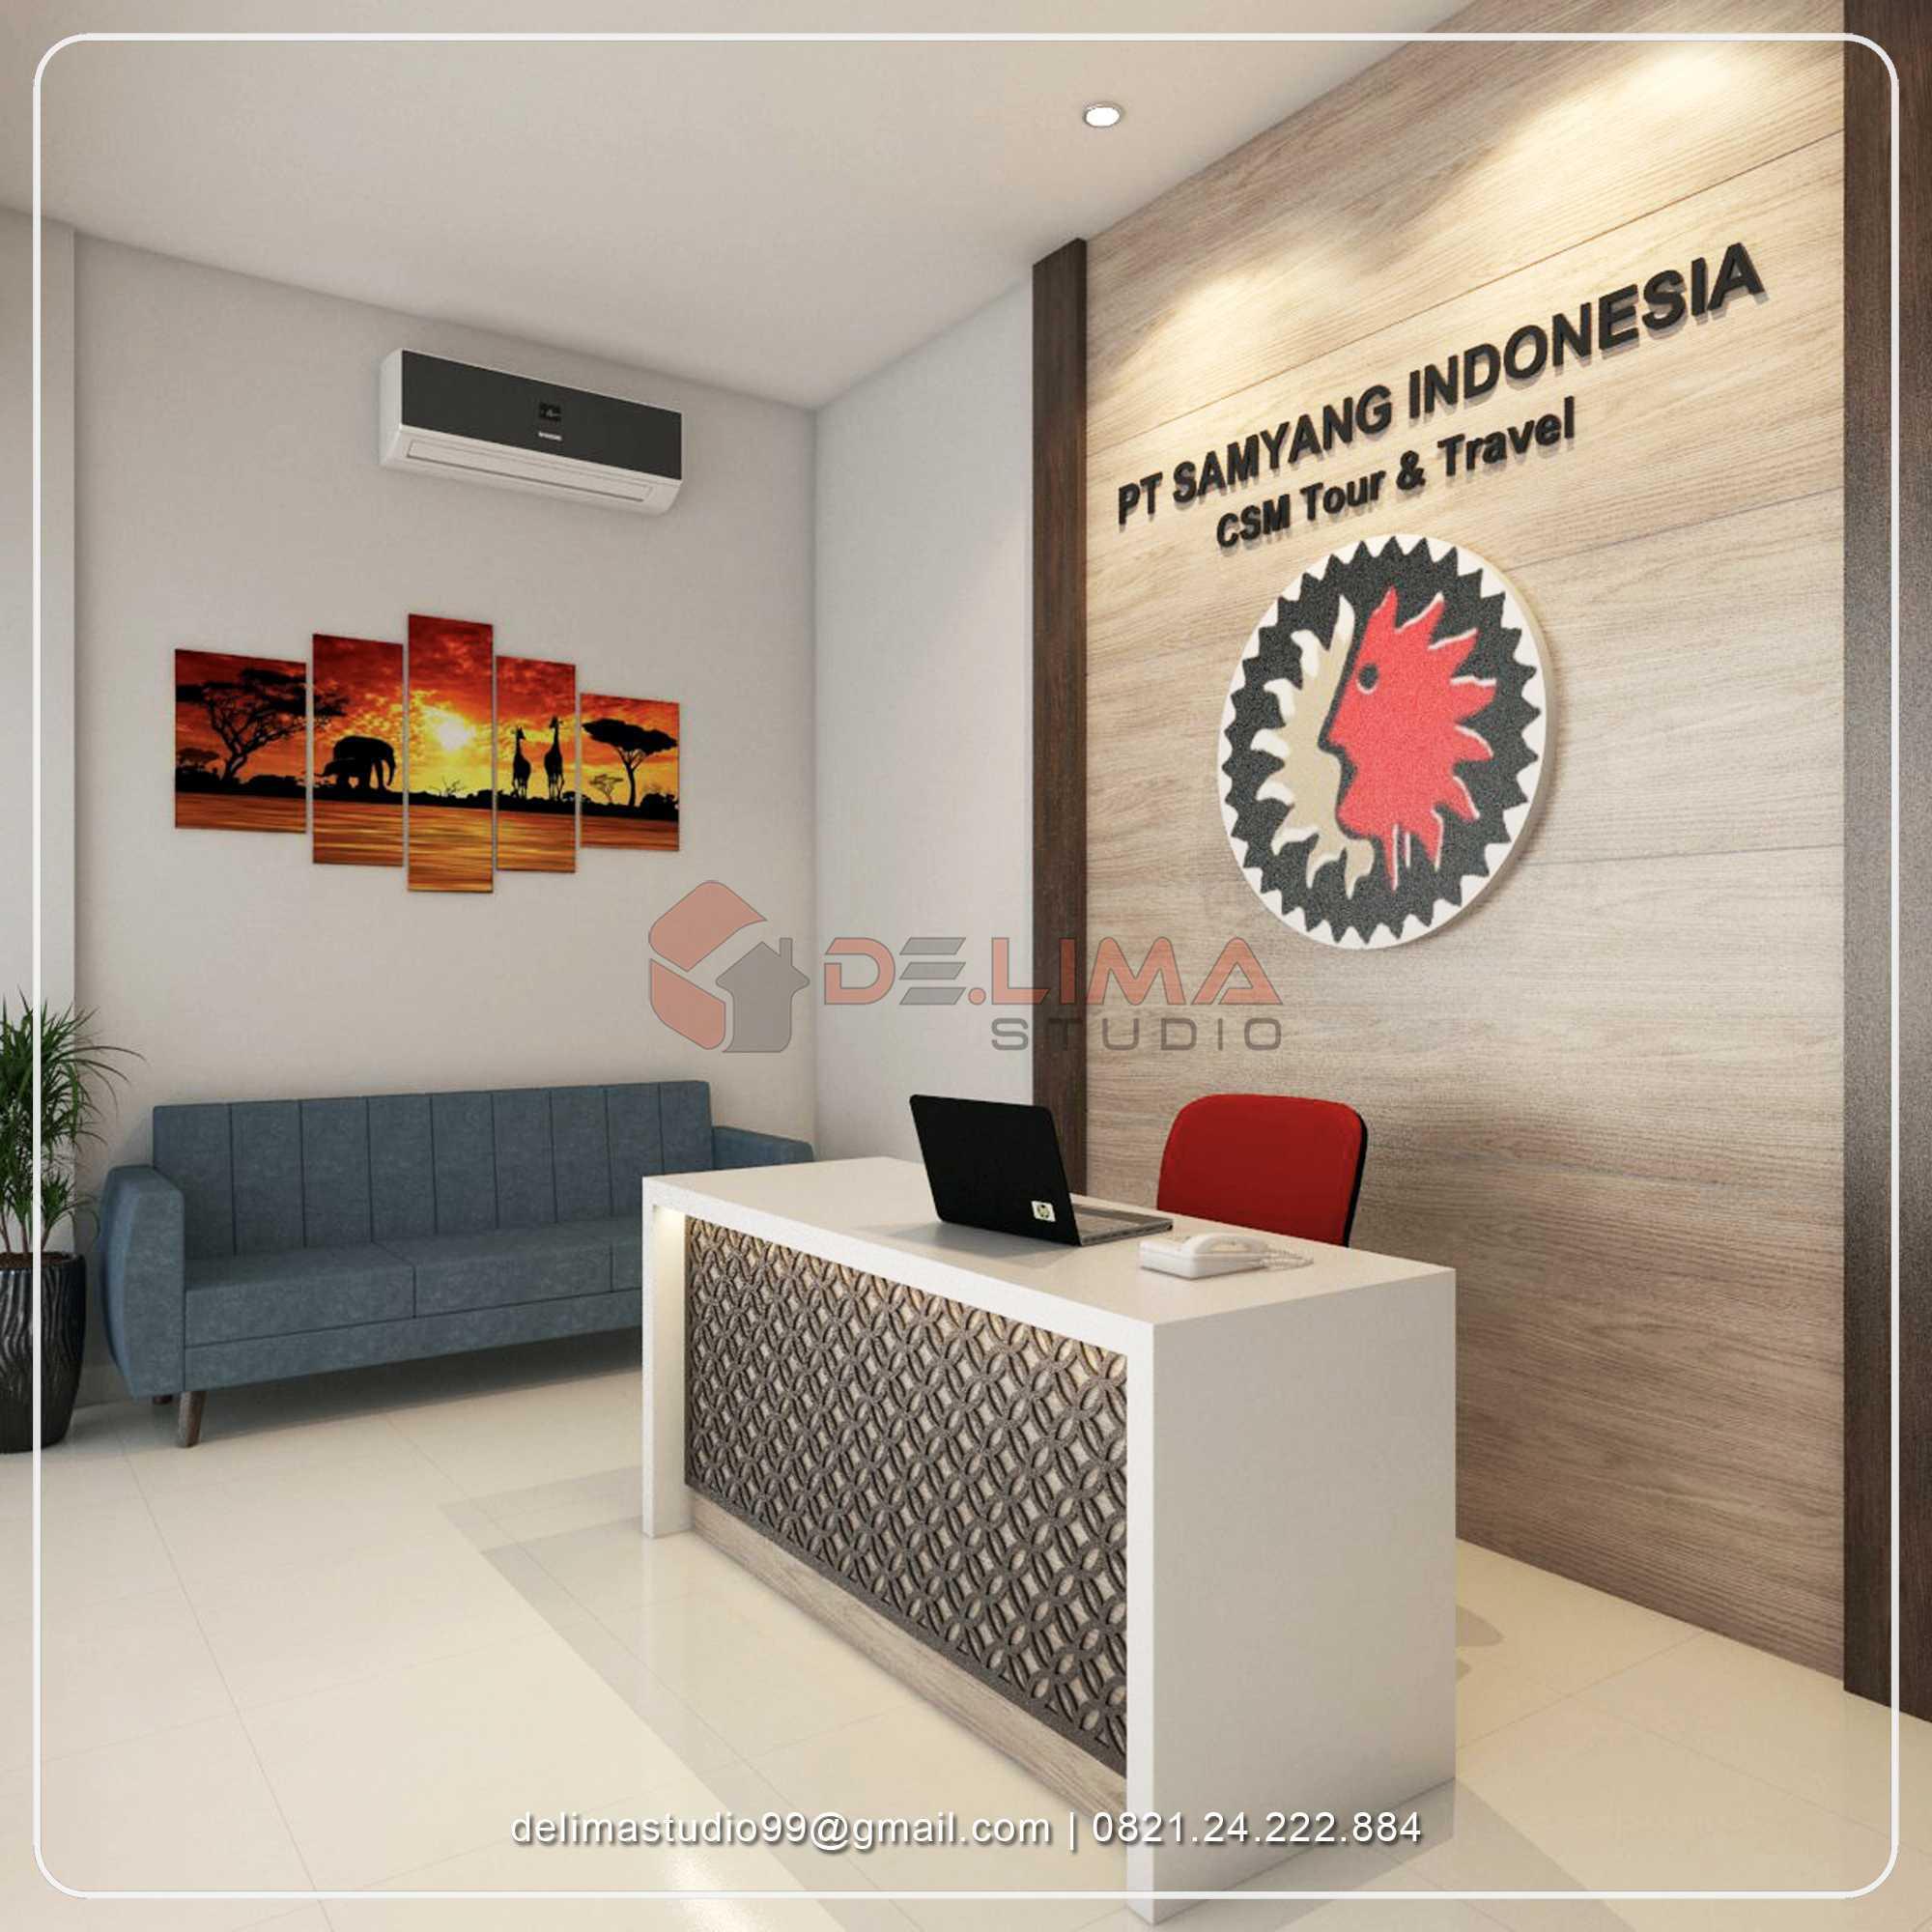 Delima Studio Office At Cikarang Sukamahi, Kec. Cikarang Pusat, Bekasi, Jawa Barat 17530, Indonesia Sukamahi, Kec. Cikarang Pusat, Bekasi, Jawa Barat 17530, Indonesia Delima-Studio-Office-At-Cikarang Modern 77707